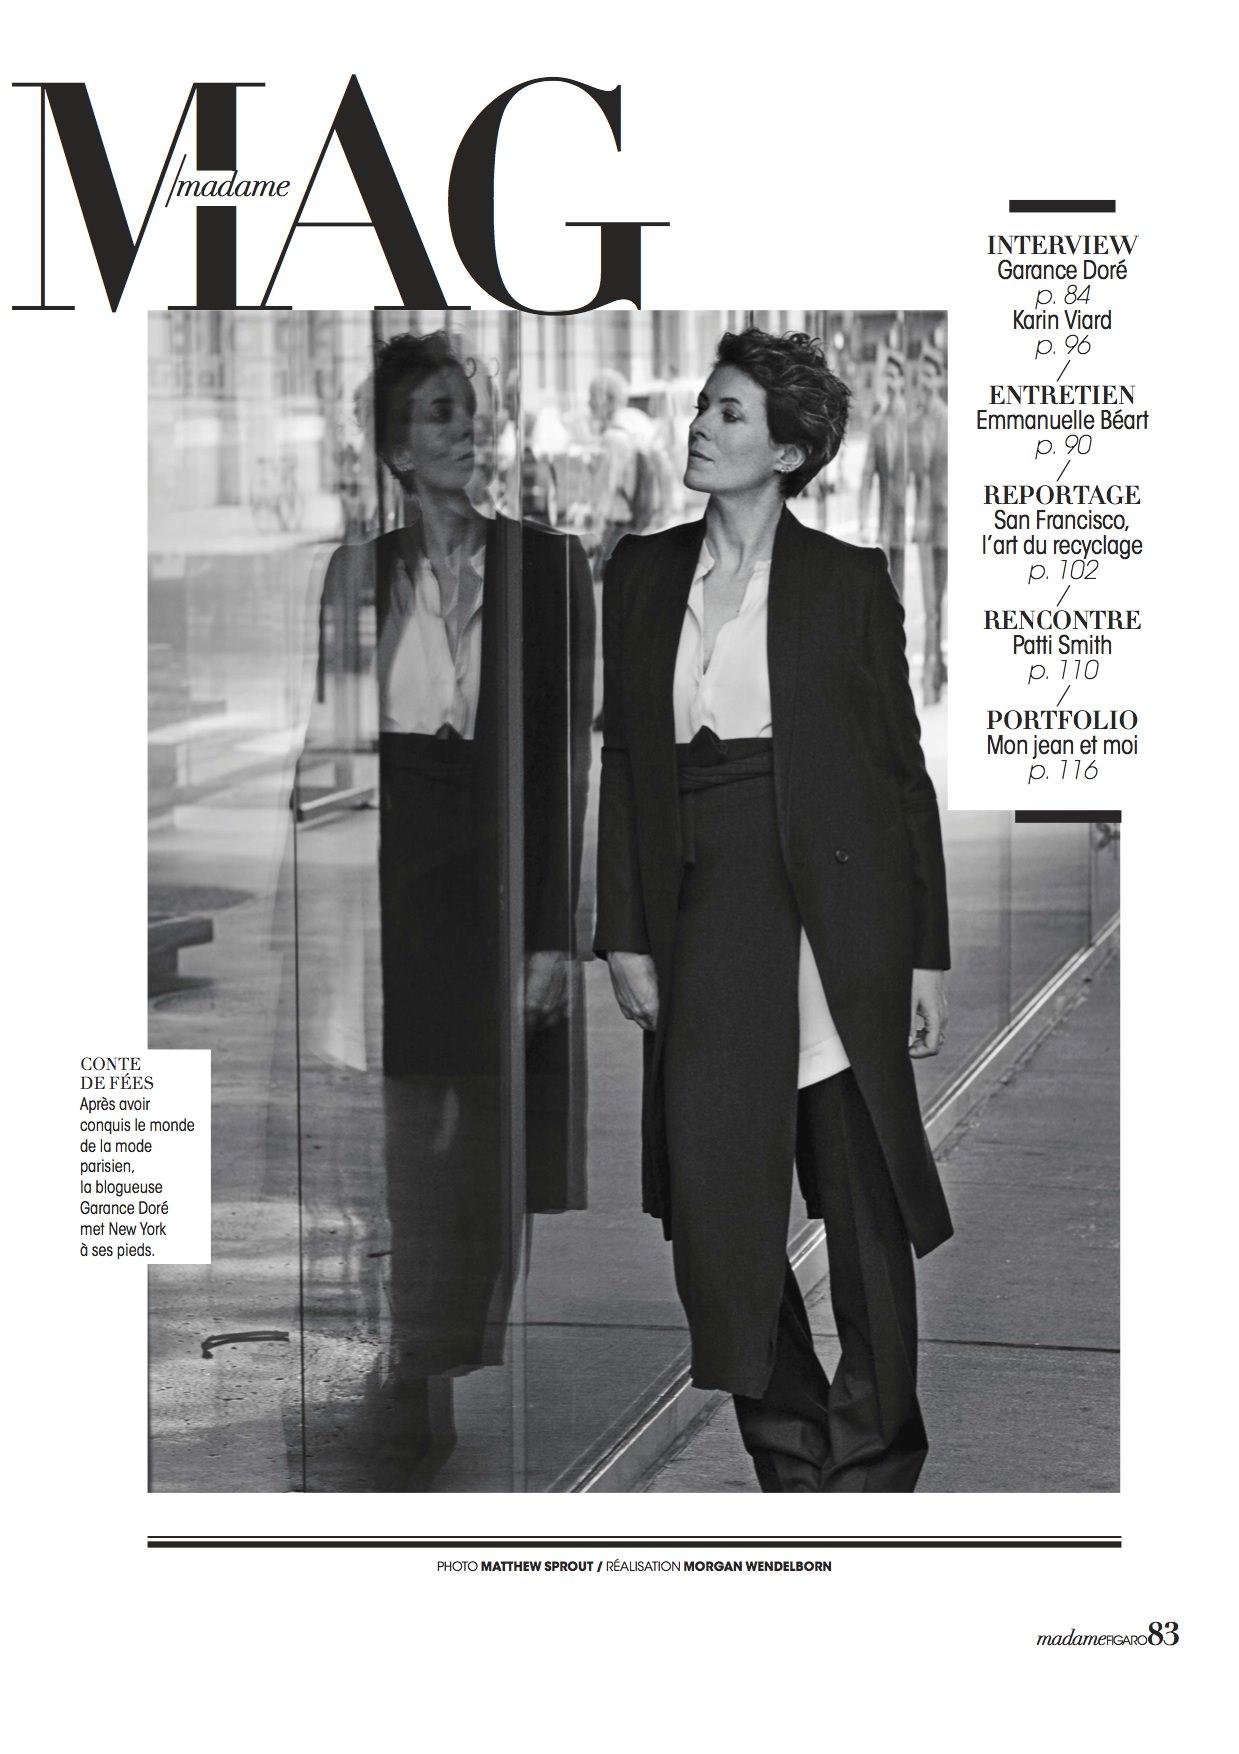 MAG Magazine cover